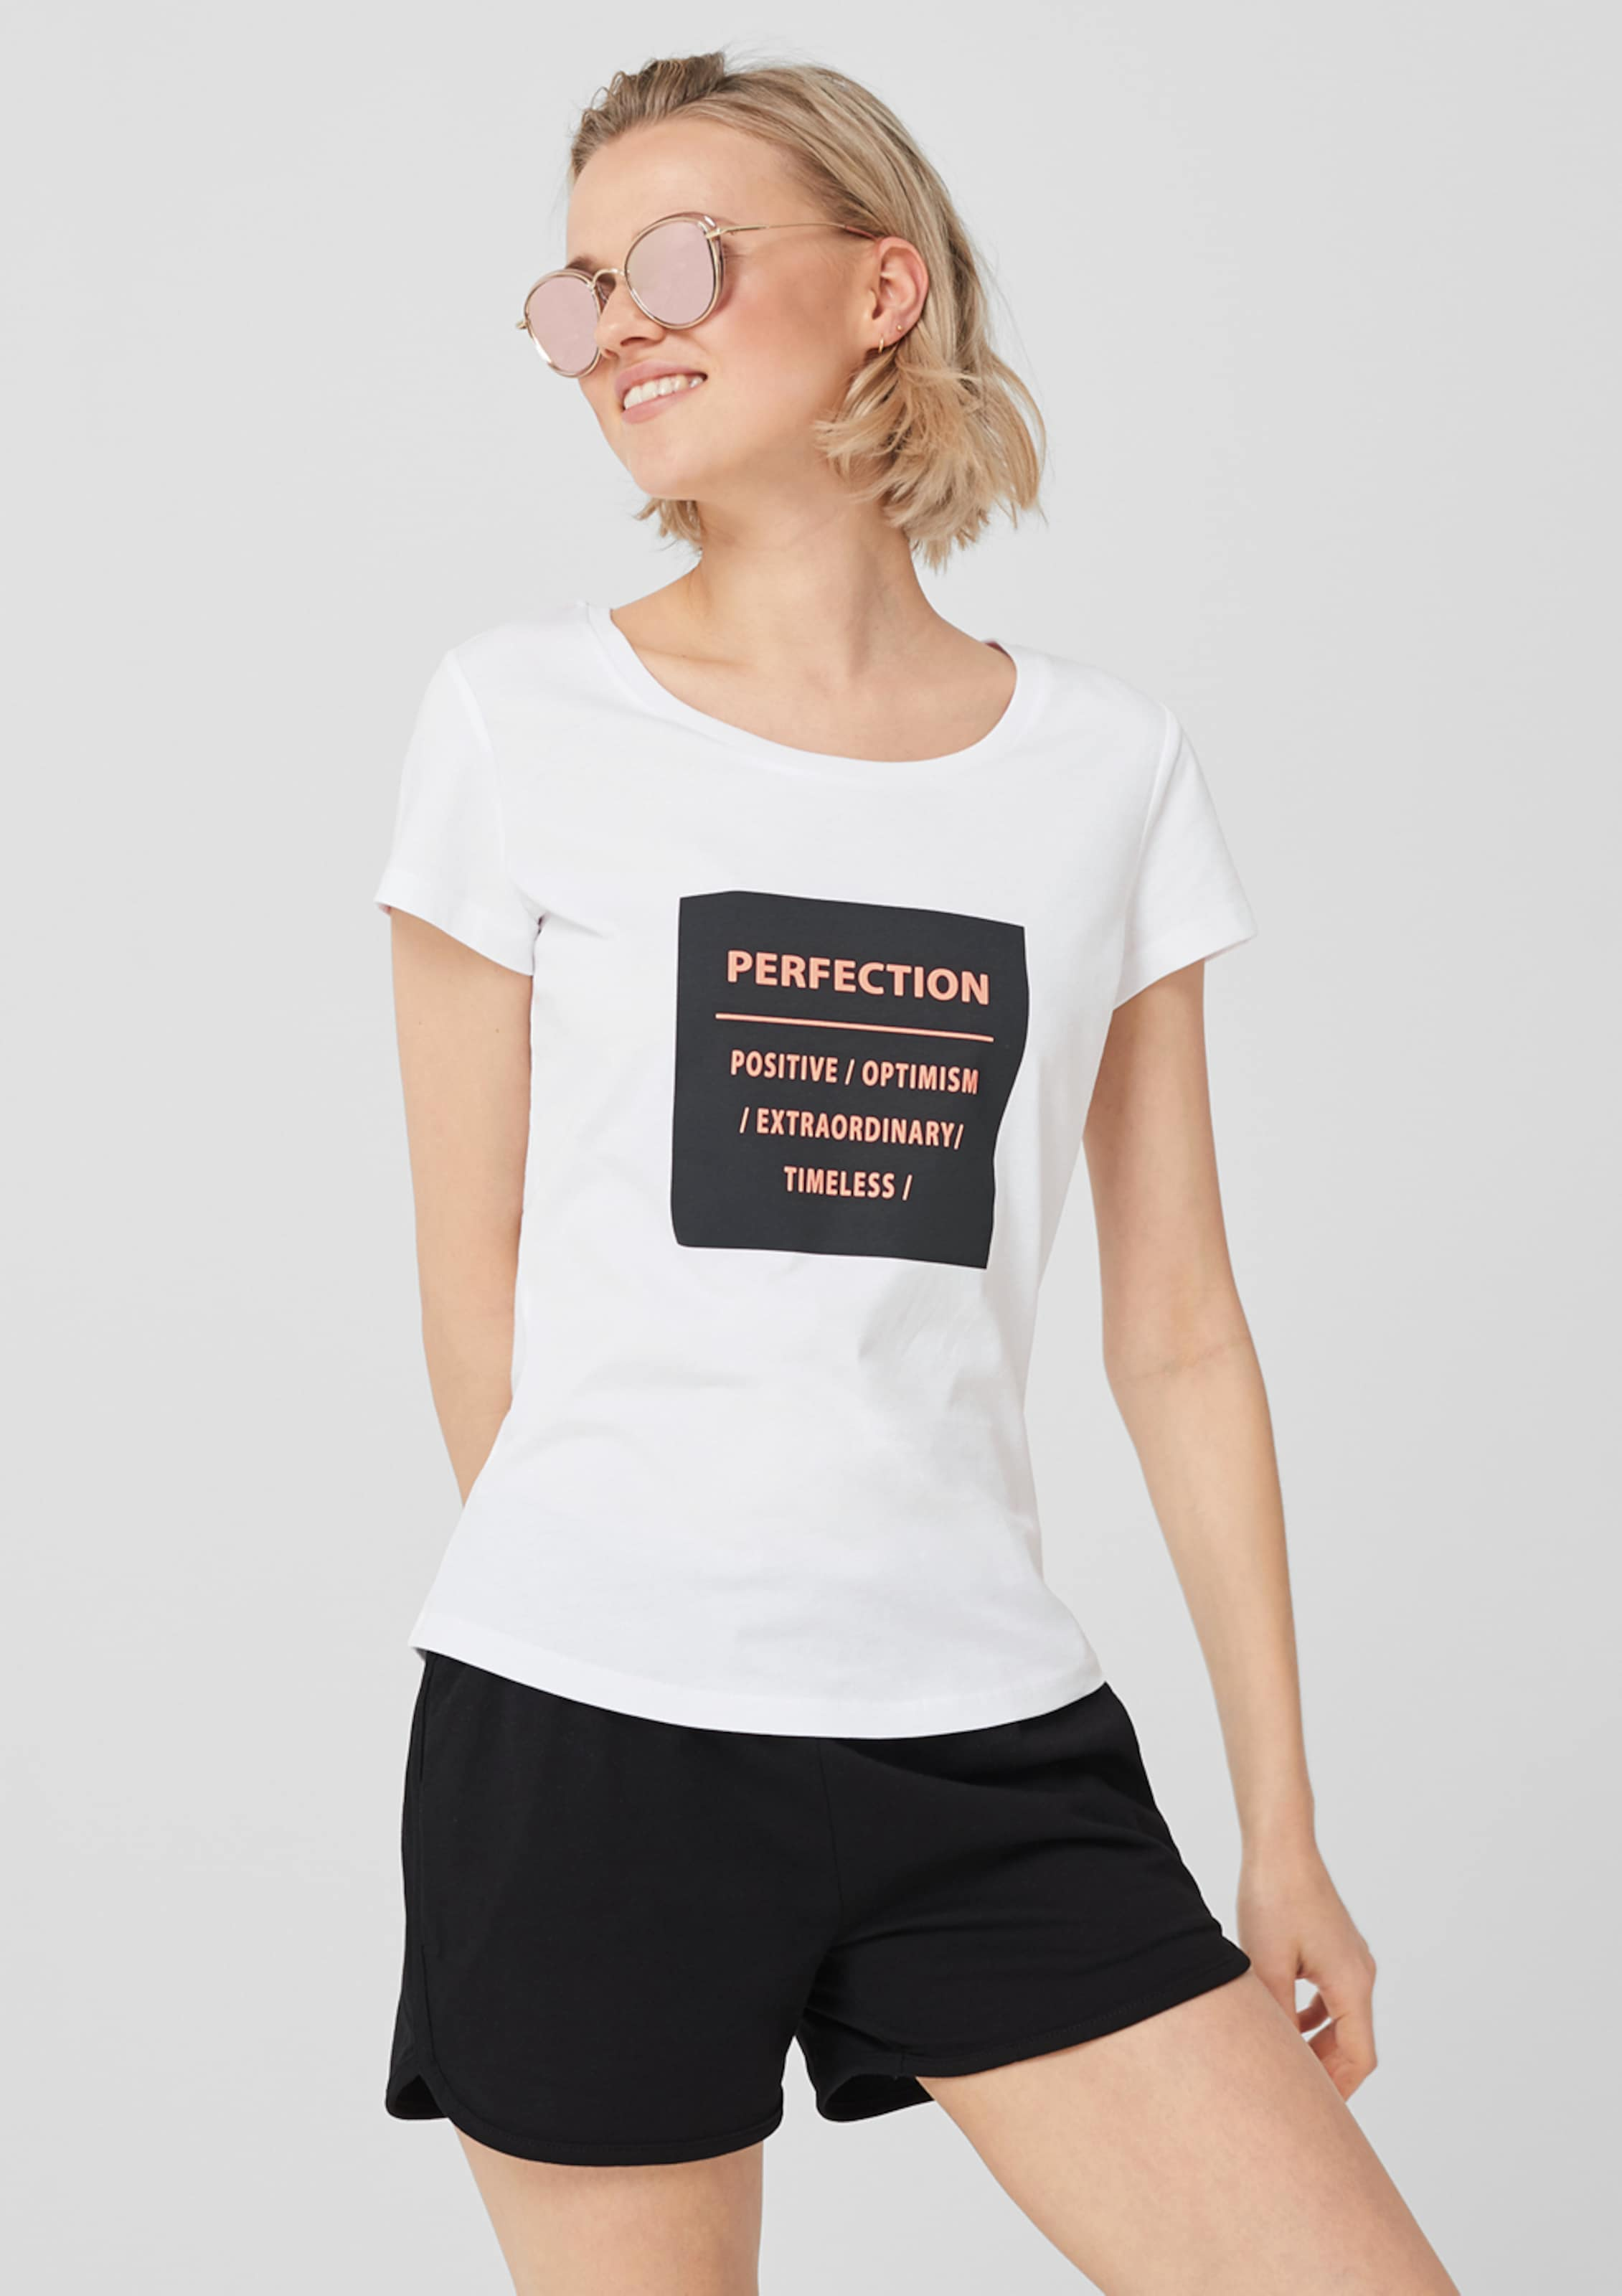 In Shirt Designed Q s By SchwarzWeiß Yf6byg7v